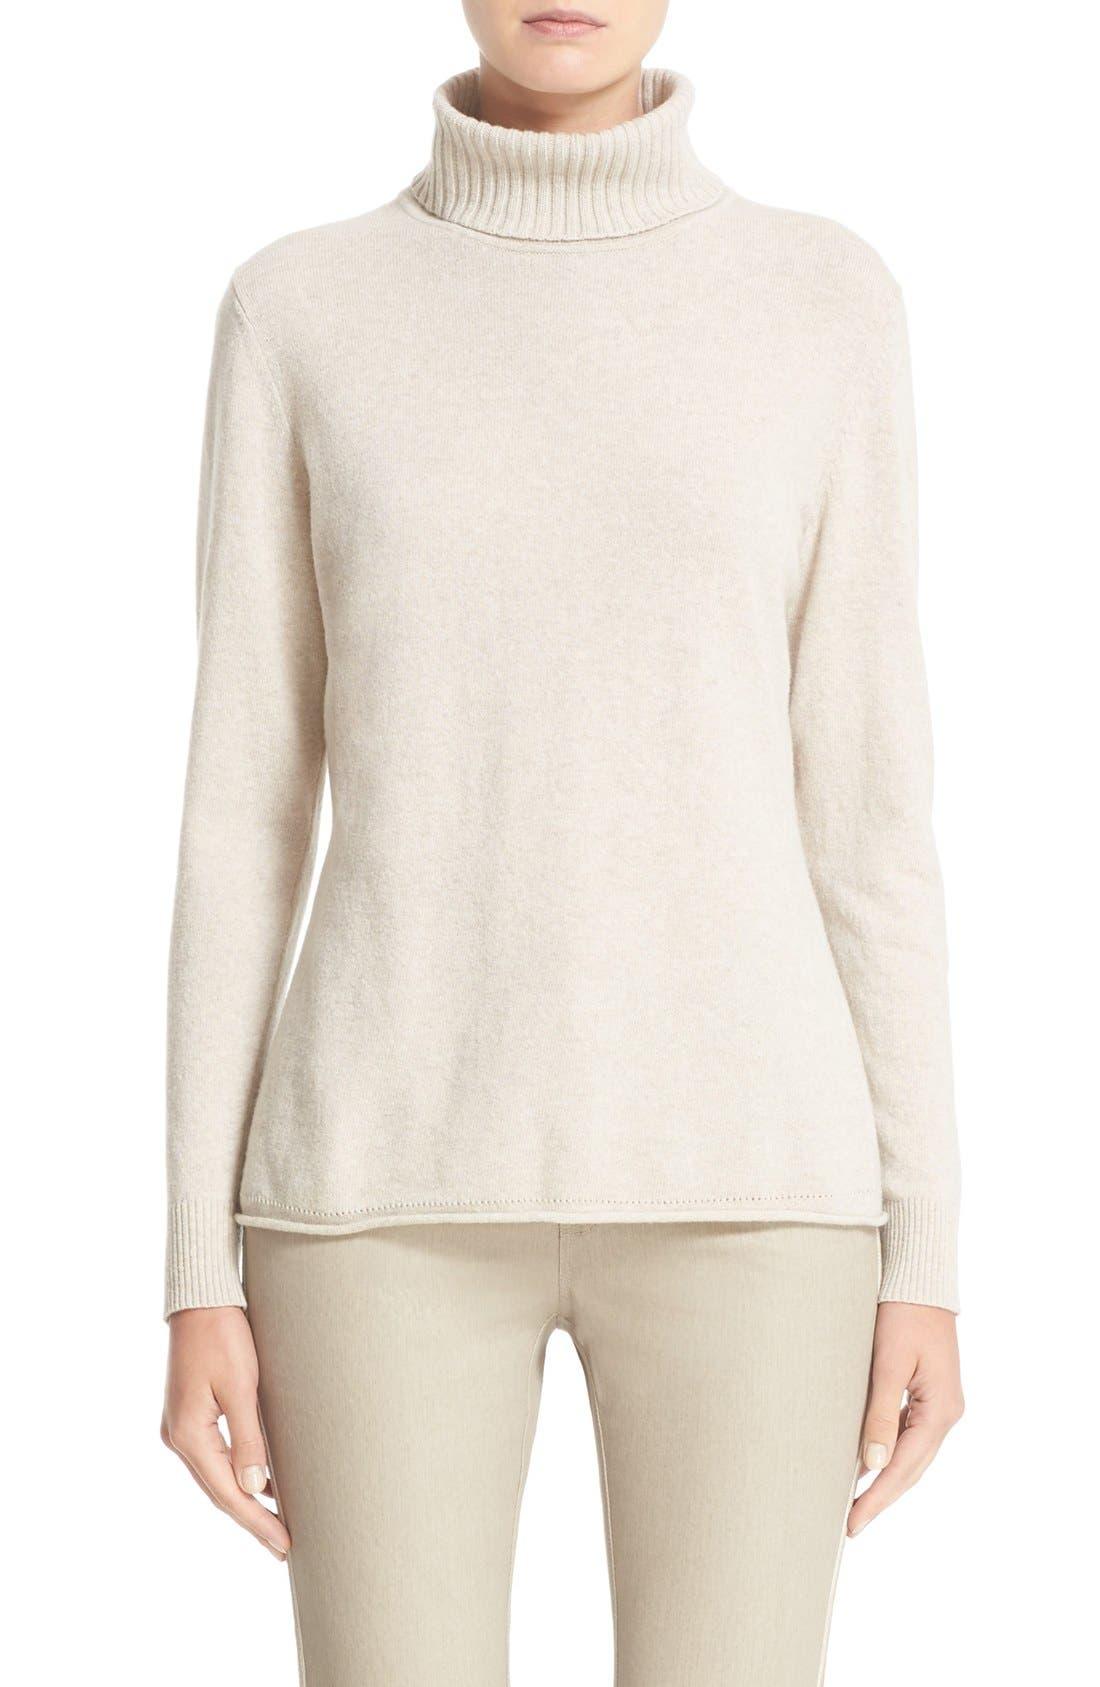 Main Image - Lafayette 148 New York Wool & Cashmere Turtleneck Sweater